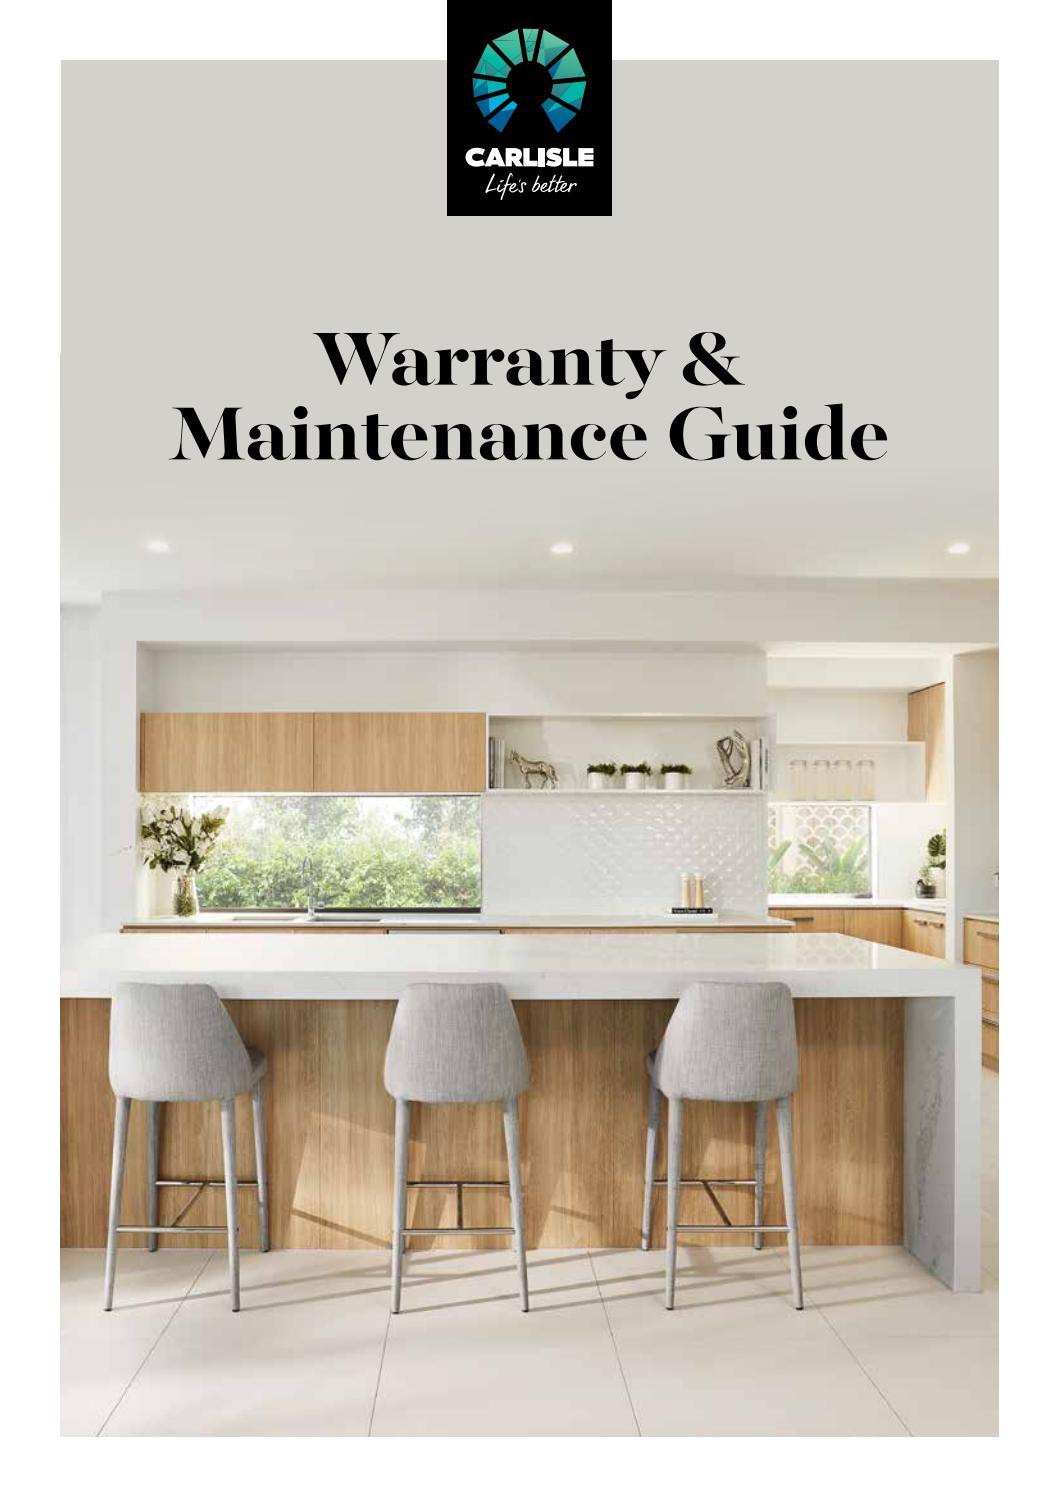 Warranty Maintenance Guide By Carlisle Homes Issuu